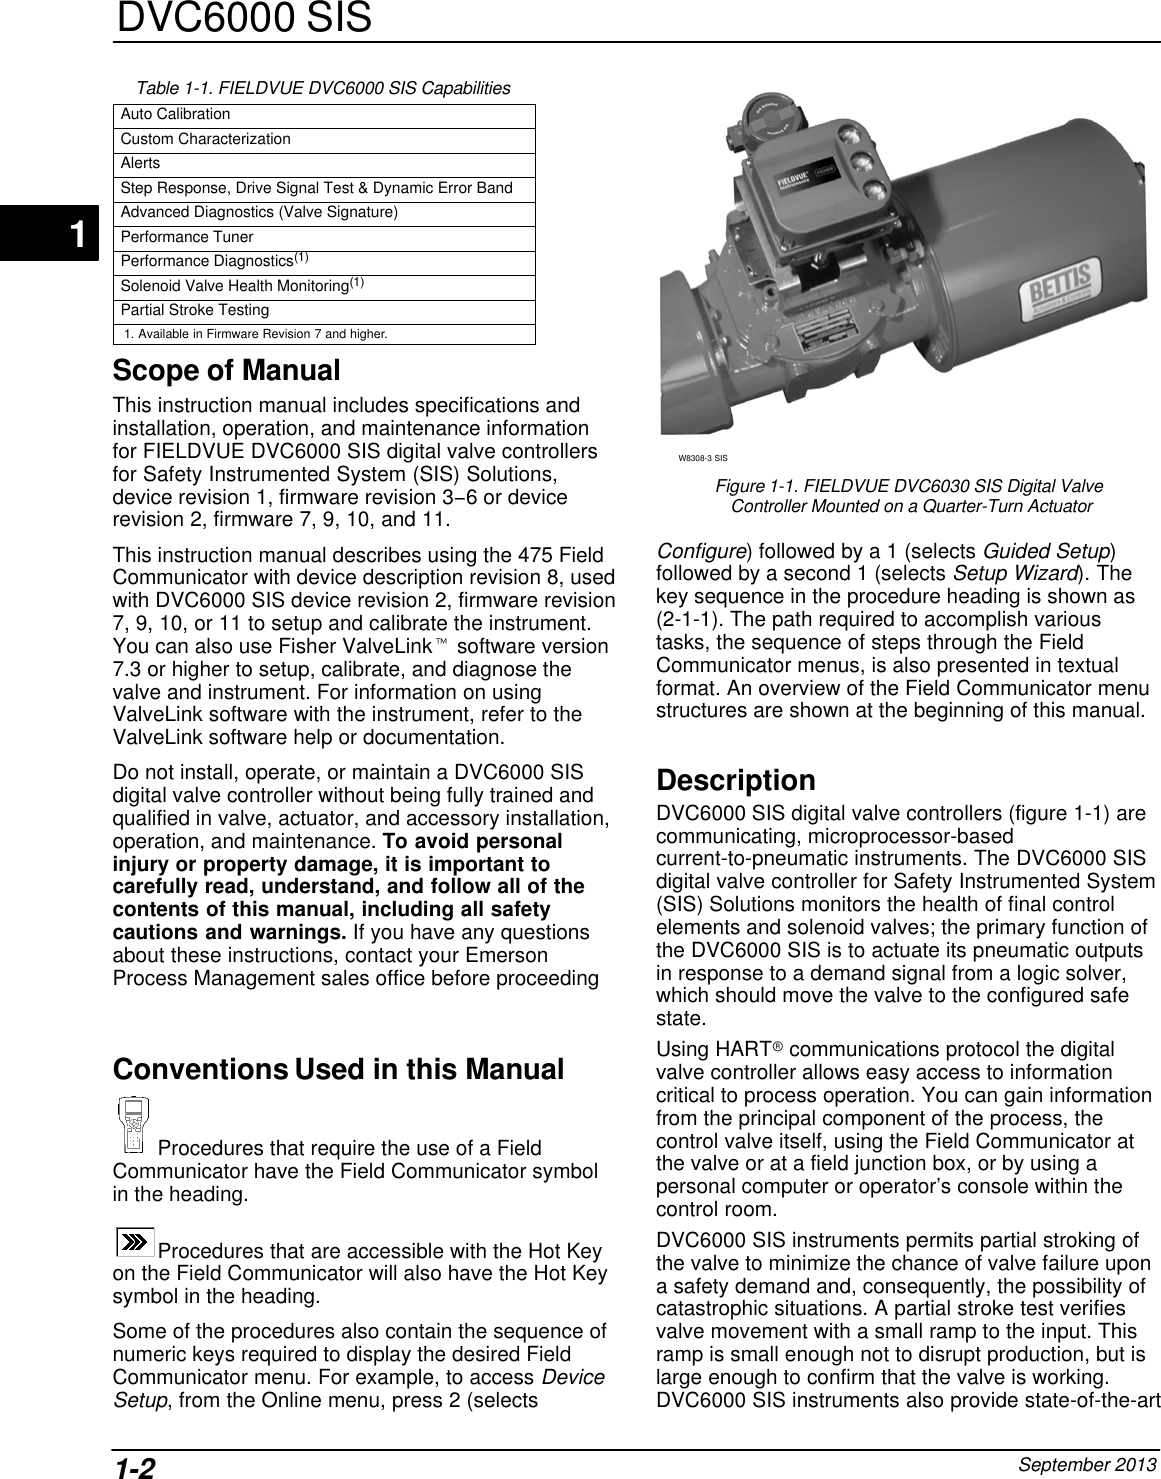 Emerson Fisher Fieldvuedvc6200 Sis Digital Valve Controller